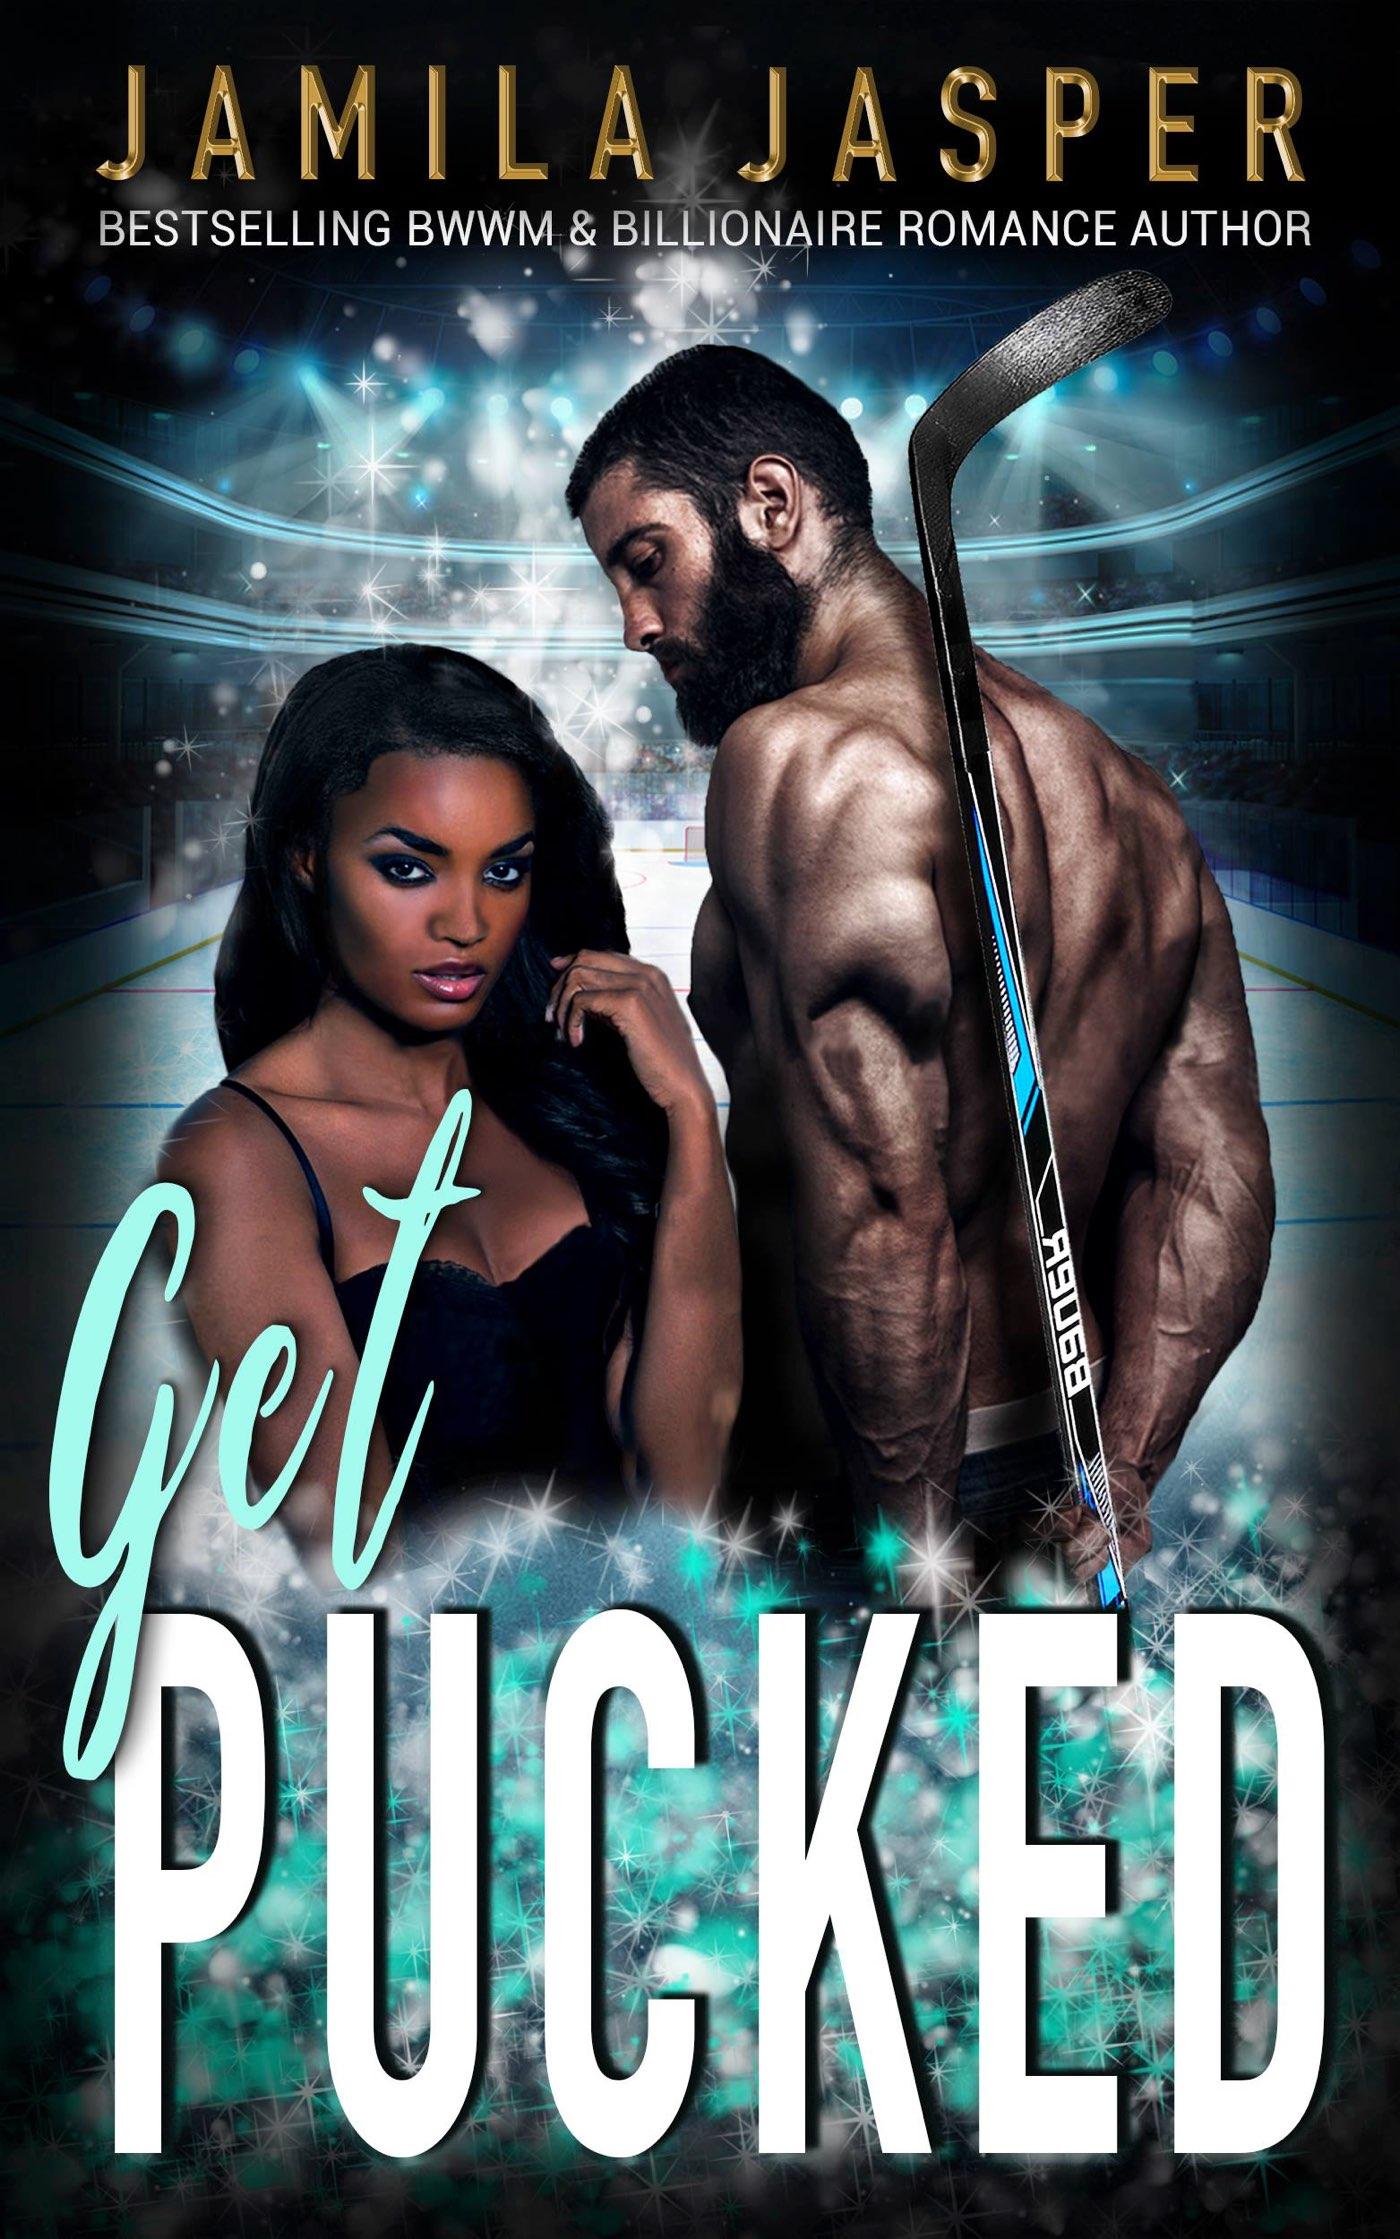 Get Pucked BWWM Interracial Romance Novels Jamila Jasper